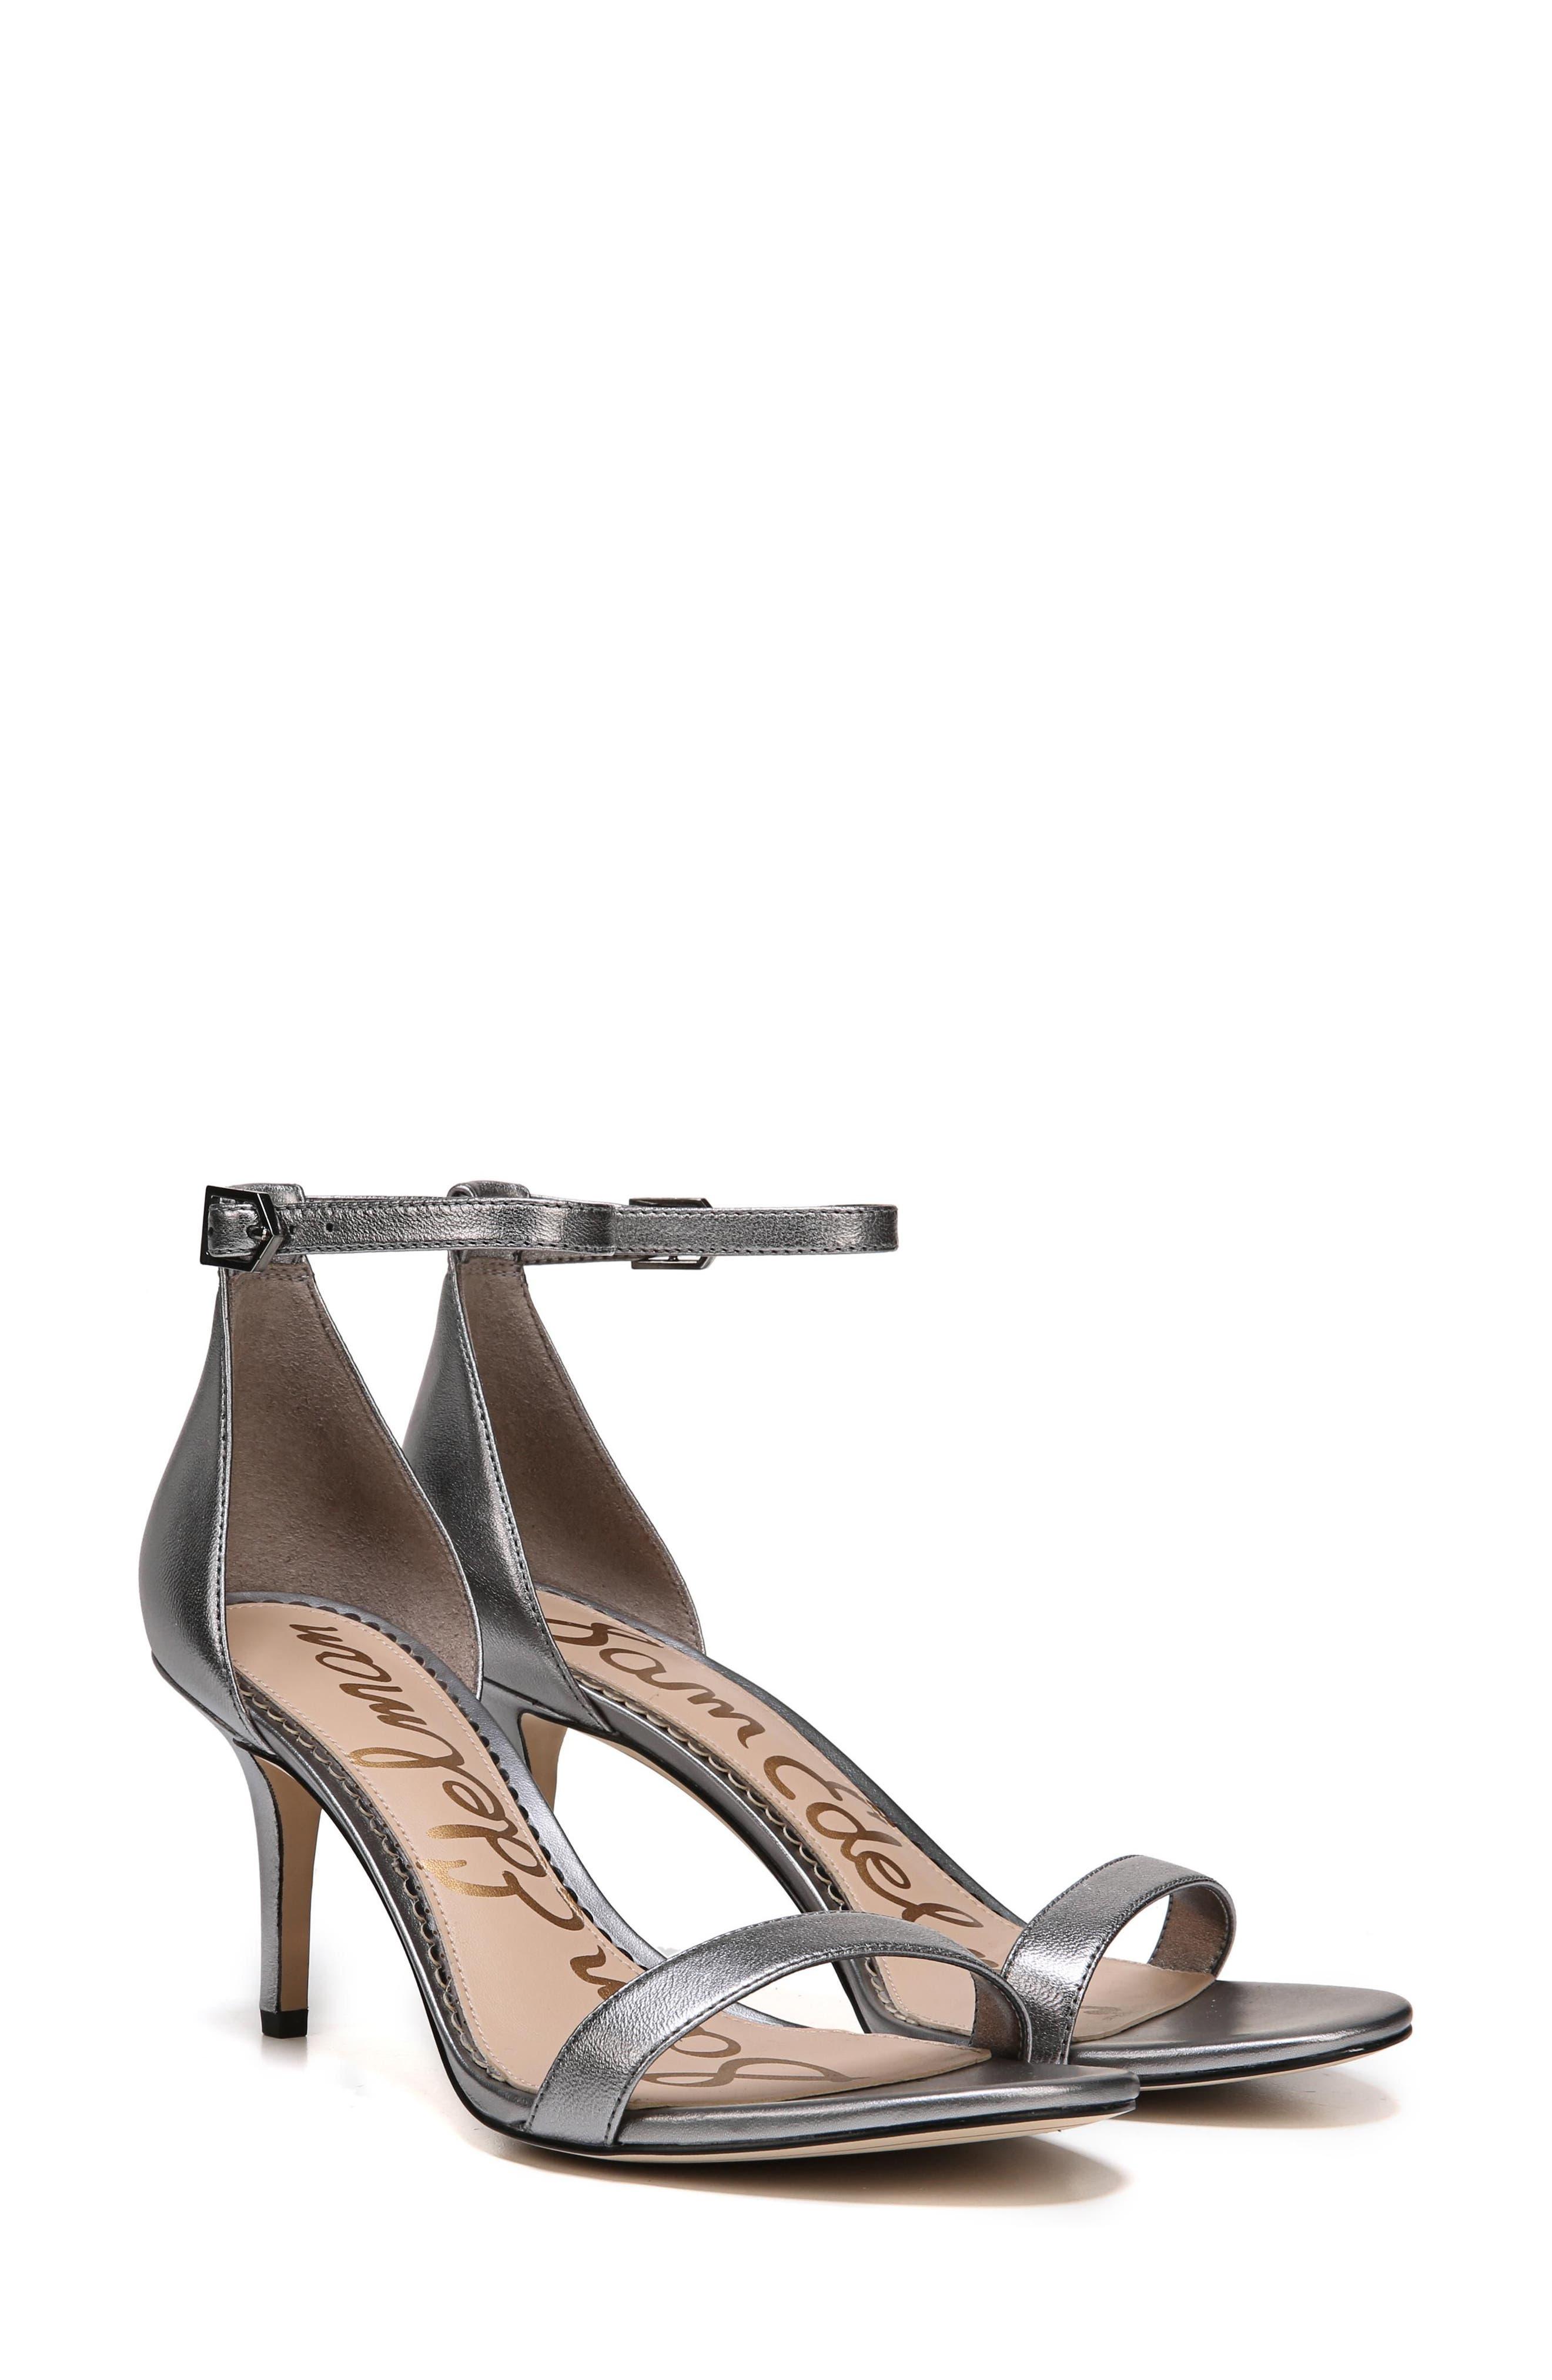 ,                             'Patti' Ankle Strap Sandal,                             Alternate thumbnail 32, color,                             040